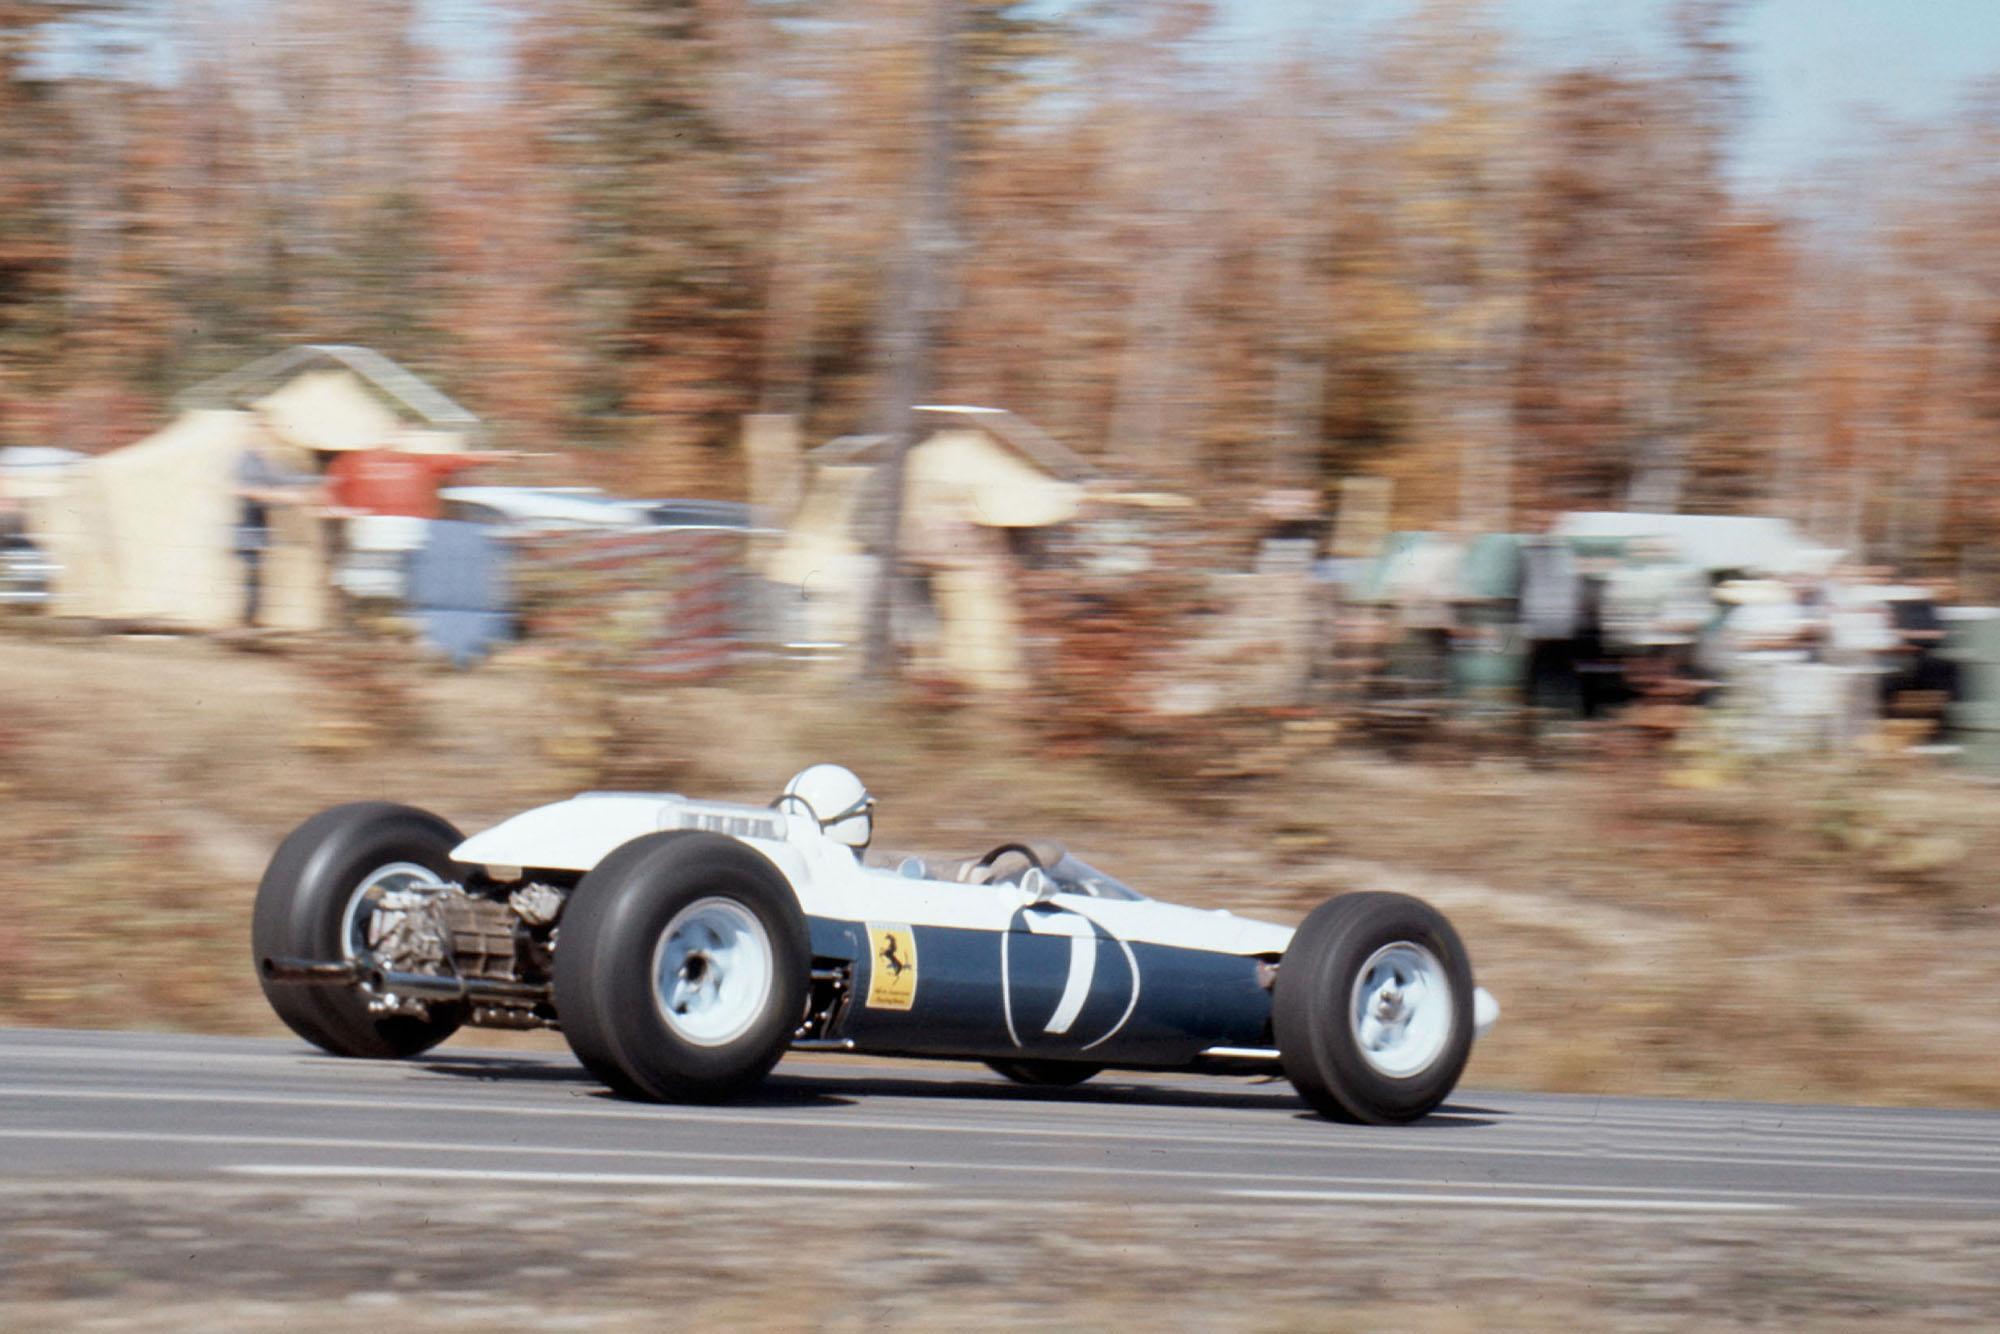 John Surtees driving for Ferrari at the 1964 United States Grand Prix.